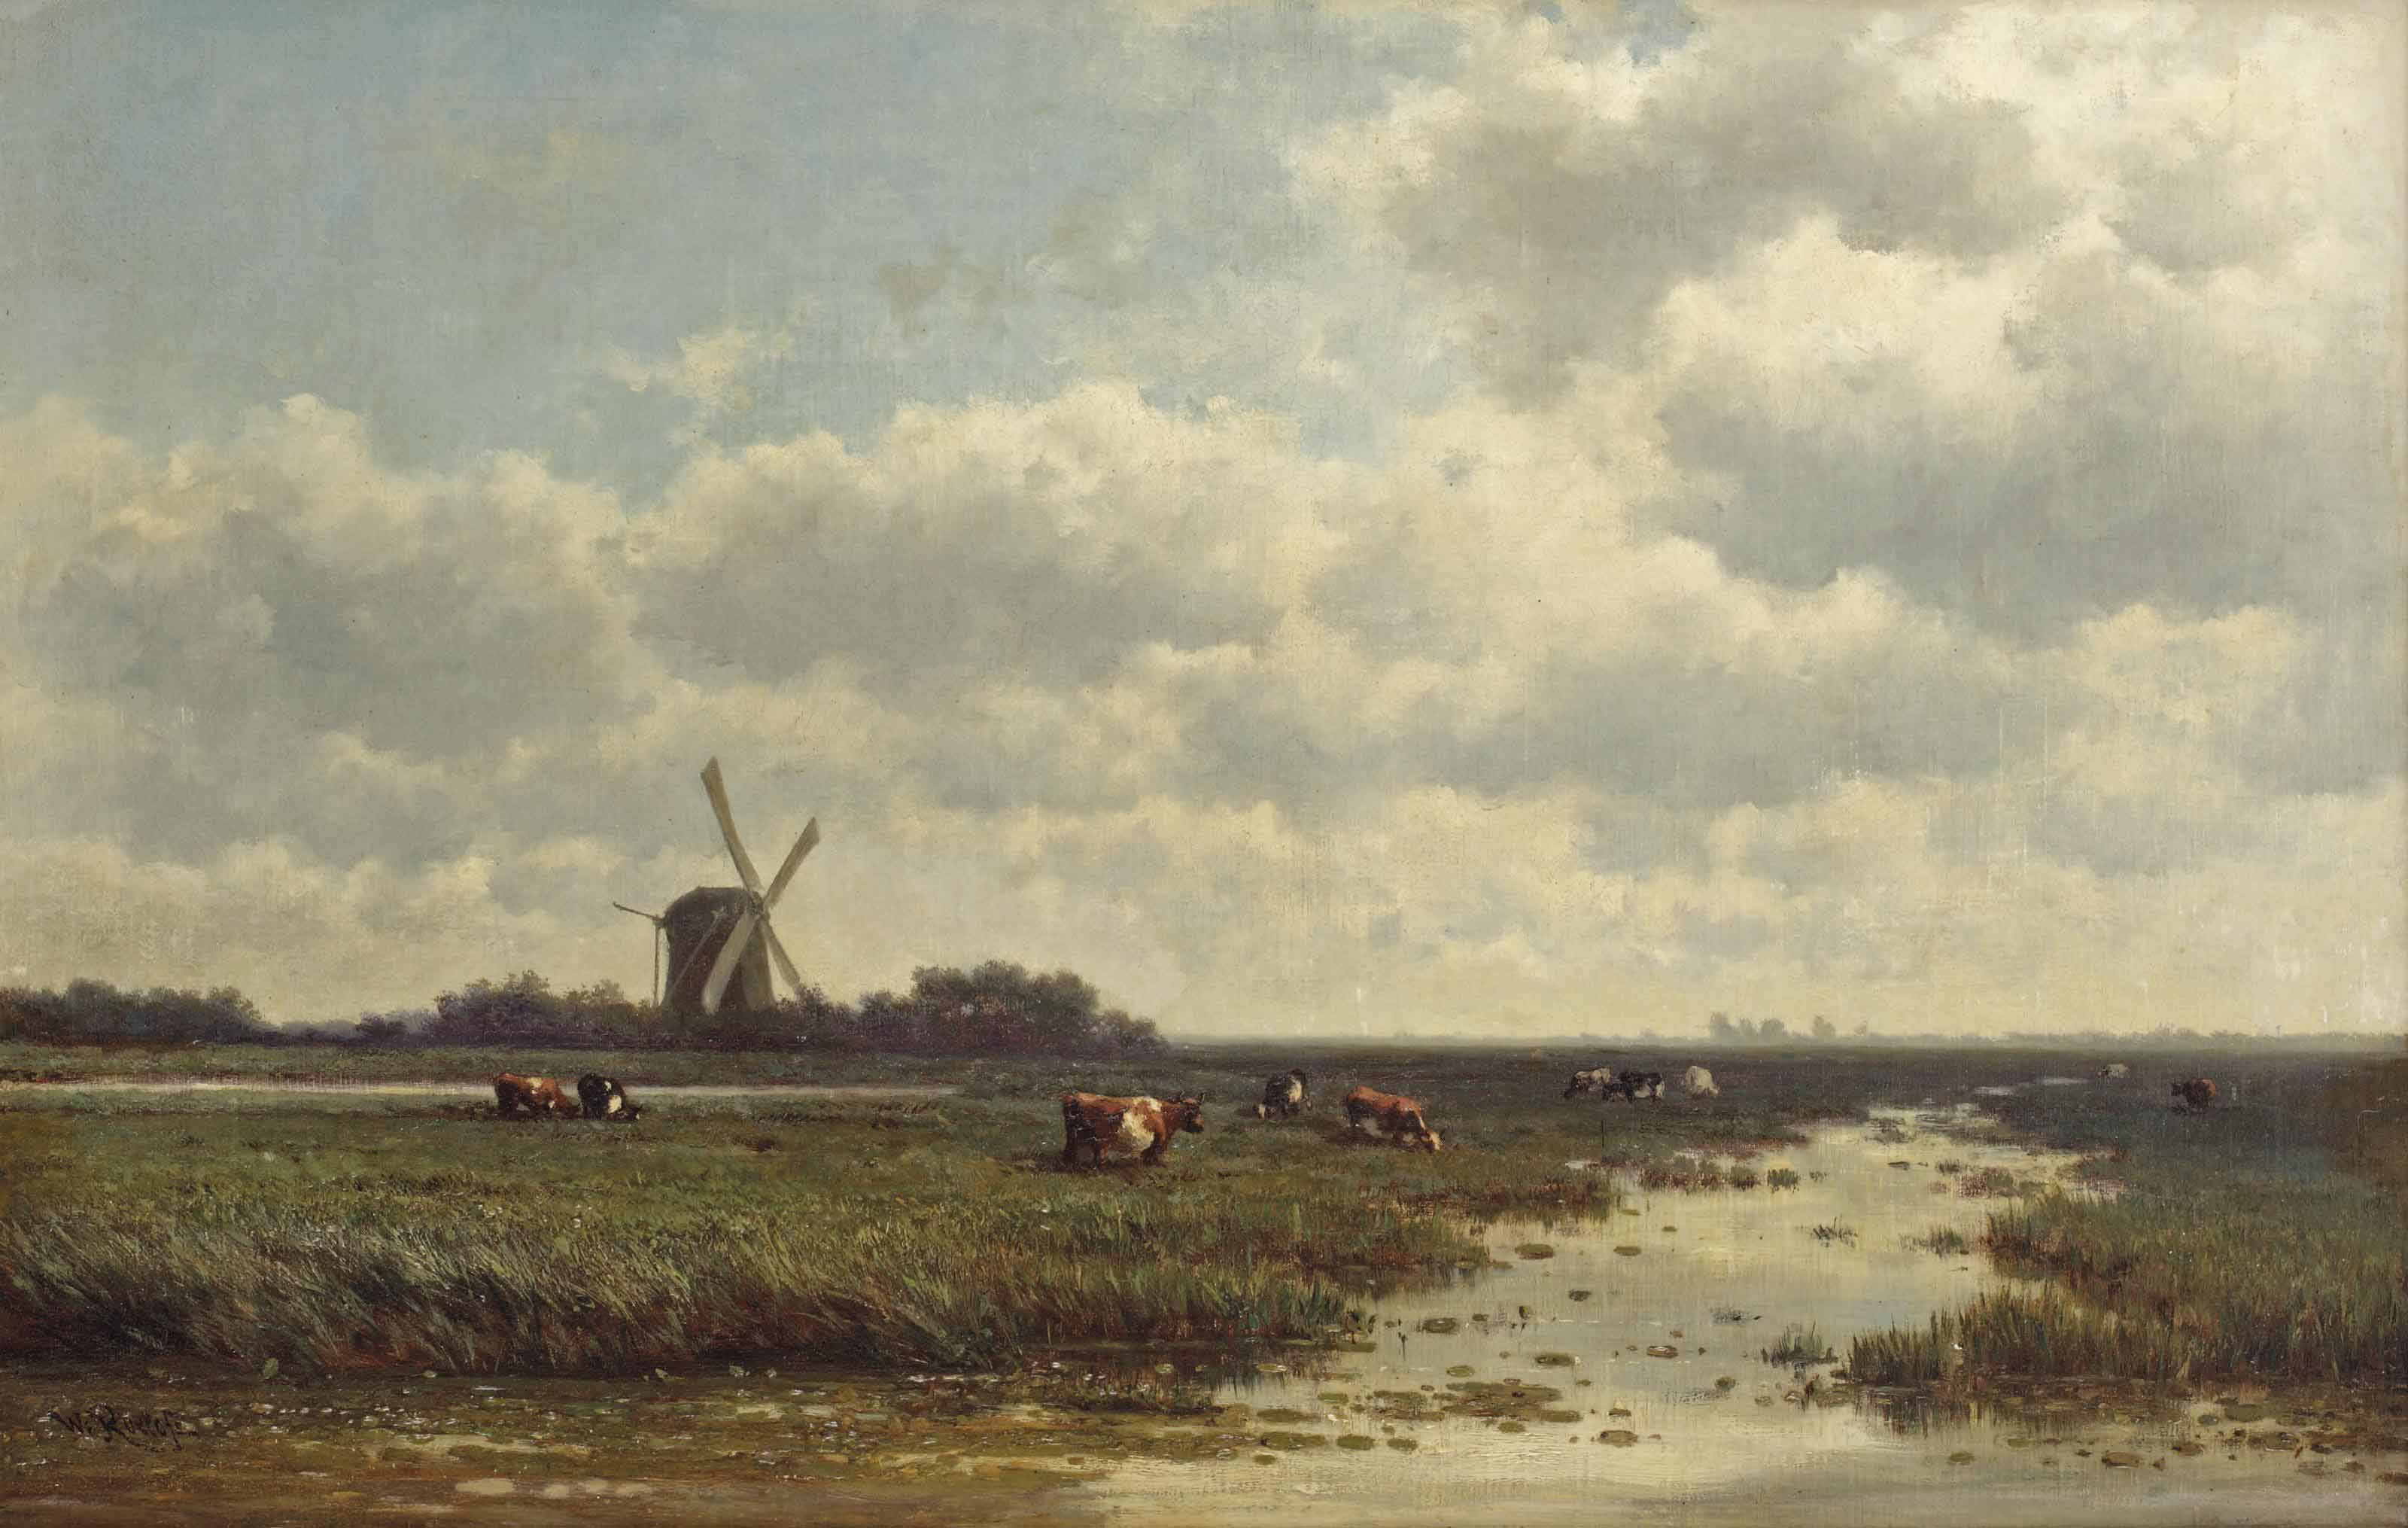 Cows grazing near a windmill